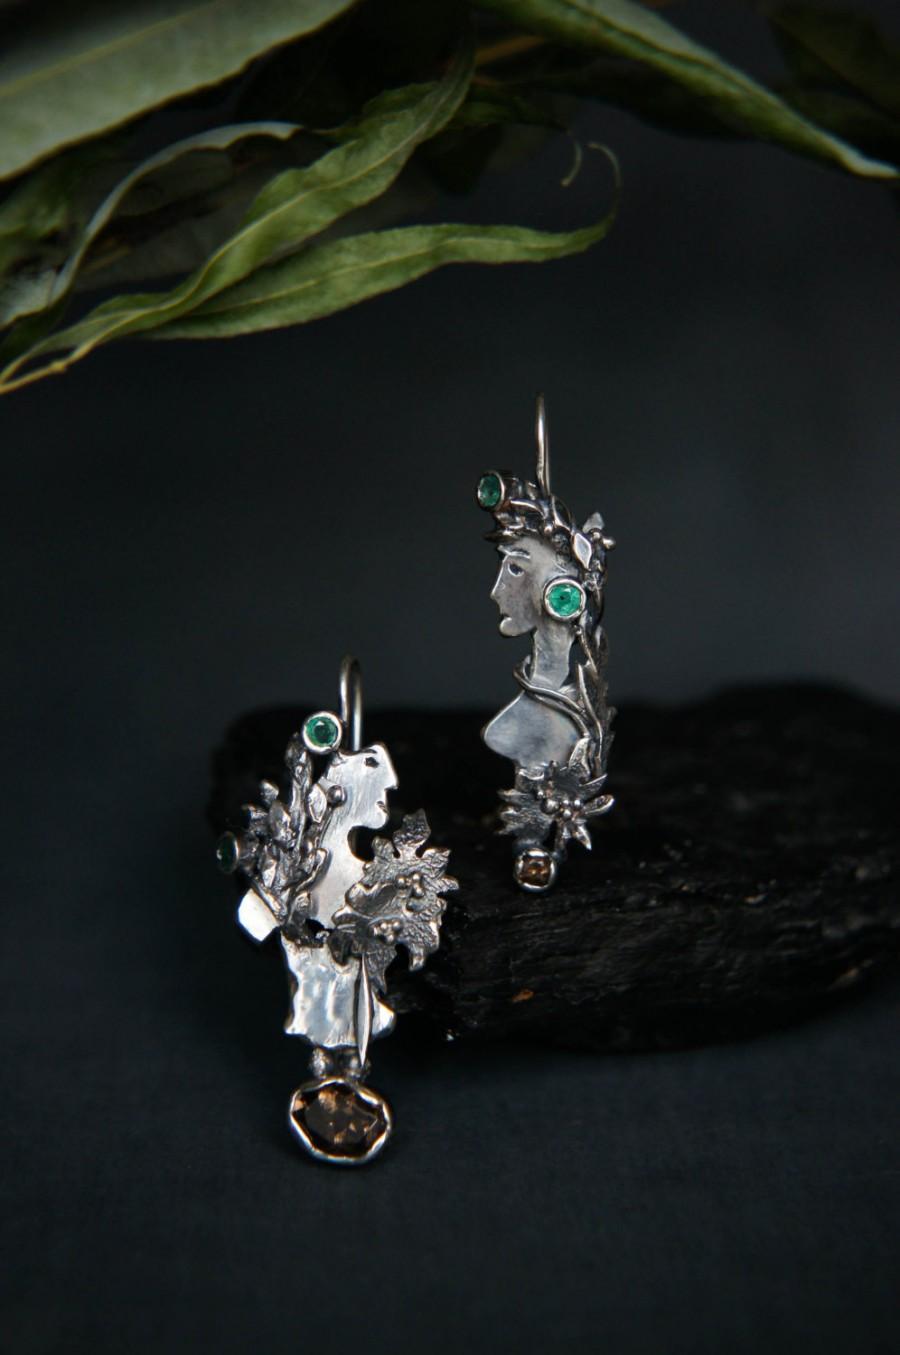 Wedding - Mismatched earrings, sterling silver earrings, modern earrings, emerald earrings, contemporary jewelry, unique earrings, designer jewelry